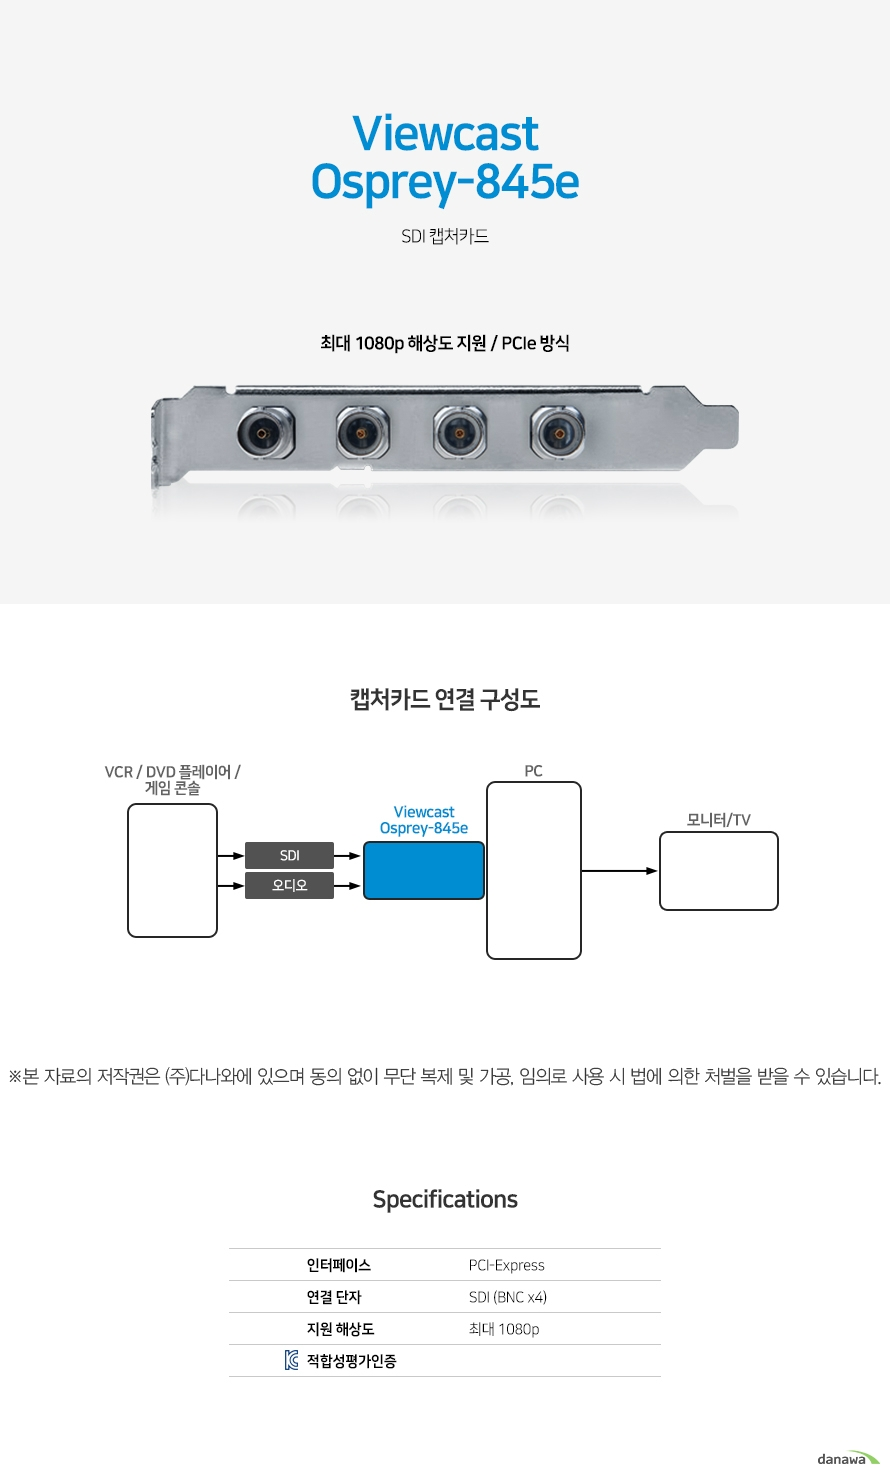 Viewcast Osprey-845e  SDI 캡처카드 최대 1080p 해상도 지원 / PCIe 방식